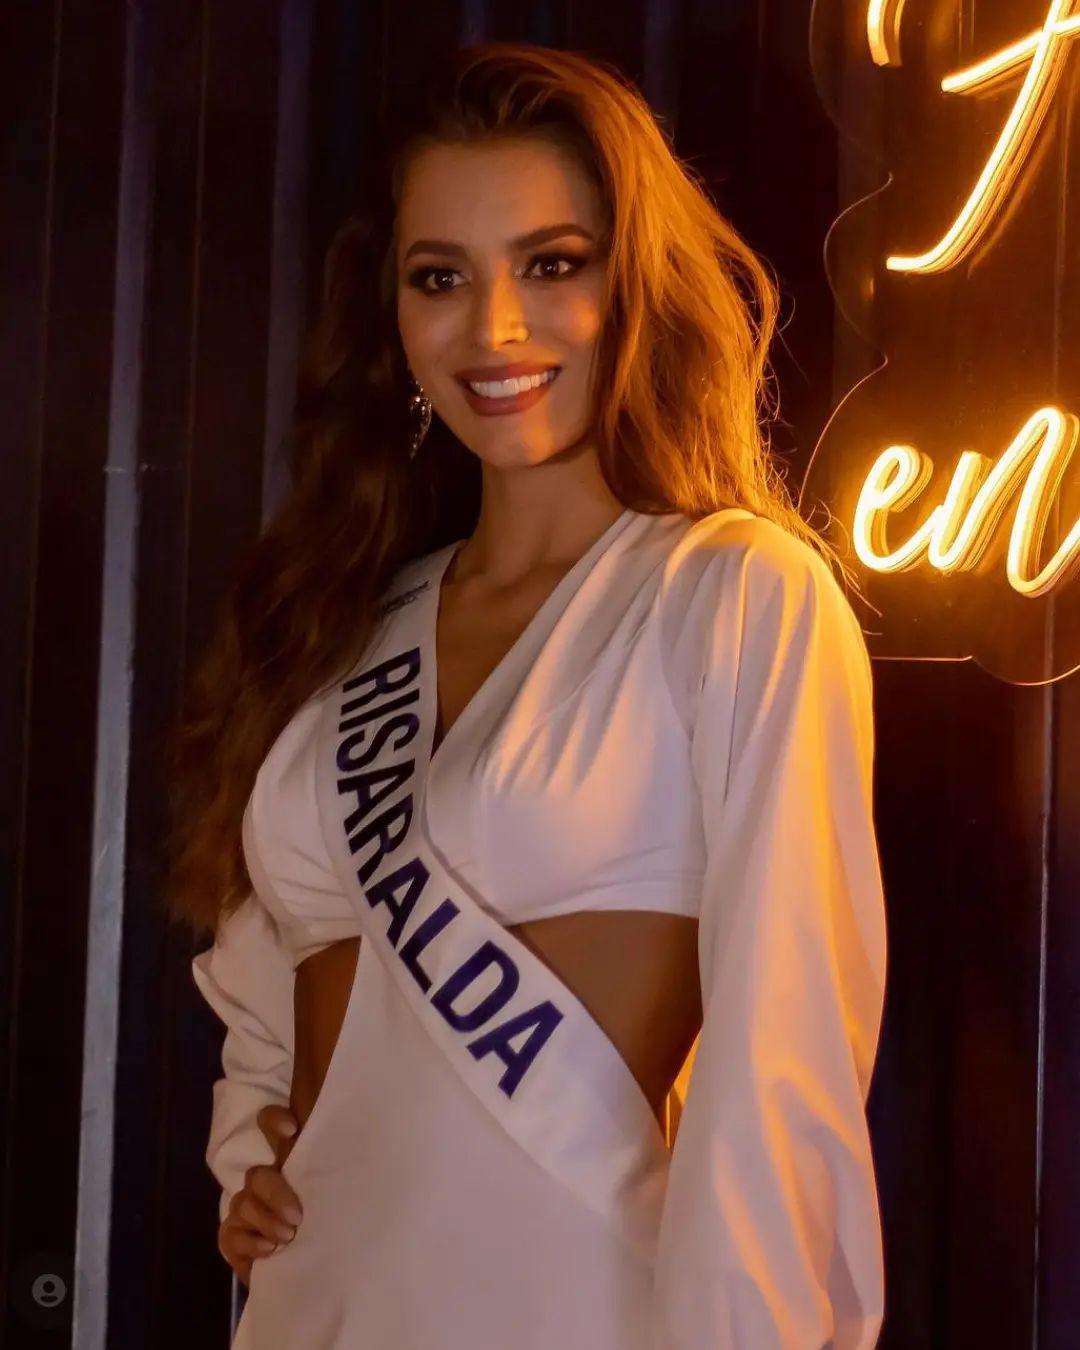 maria alejandra lopez perez, top 2 de miss universe colombia 2021/reyna hispanoamericana 2013/miss caraibes hibiscus 2014/miss colombia mundo 2015. - Página 5 5fm87i10